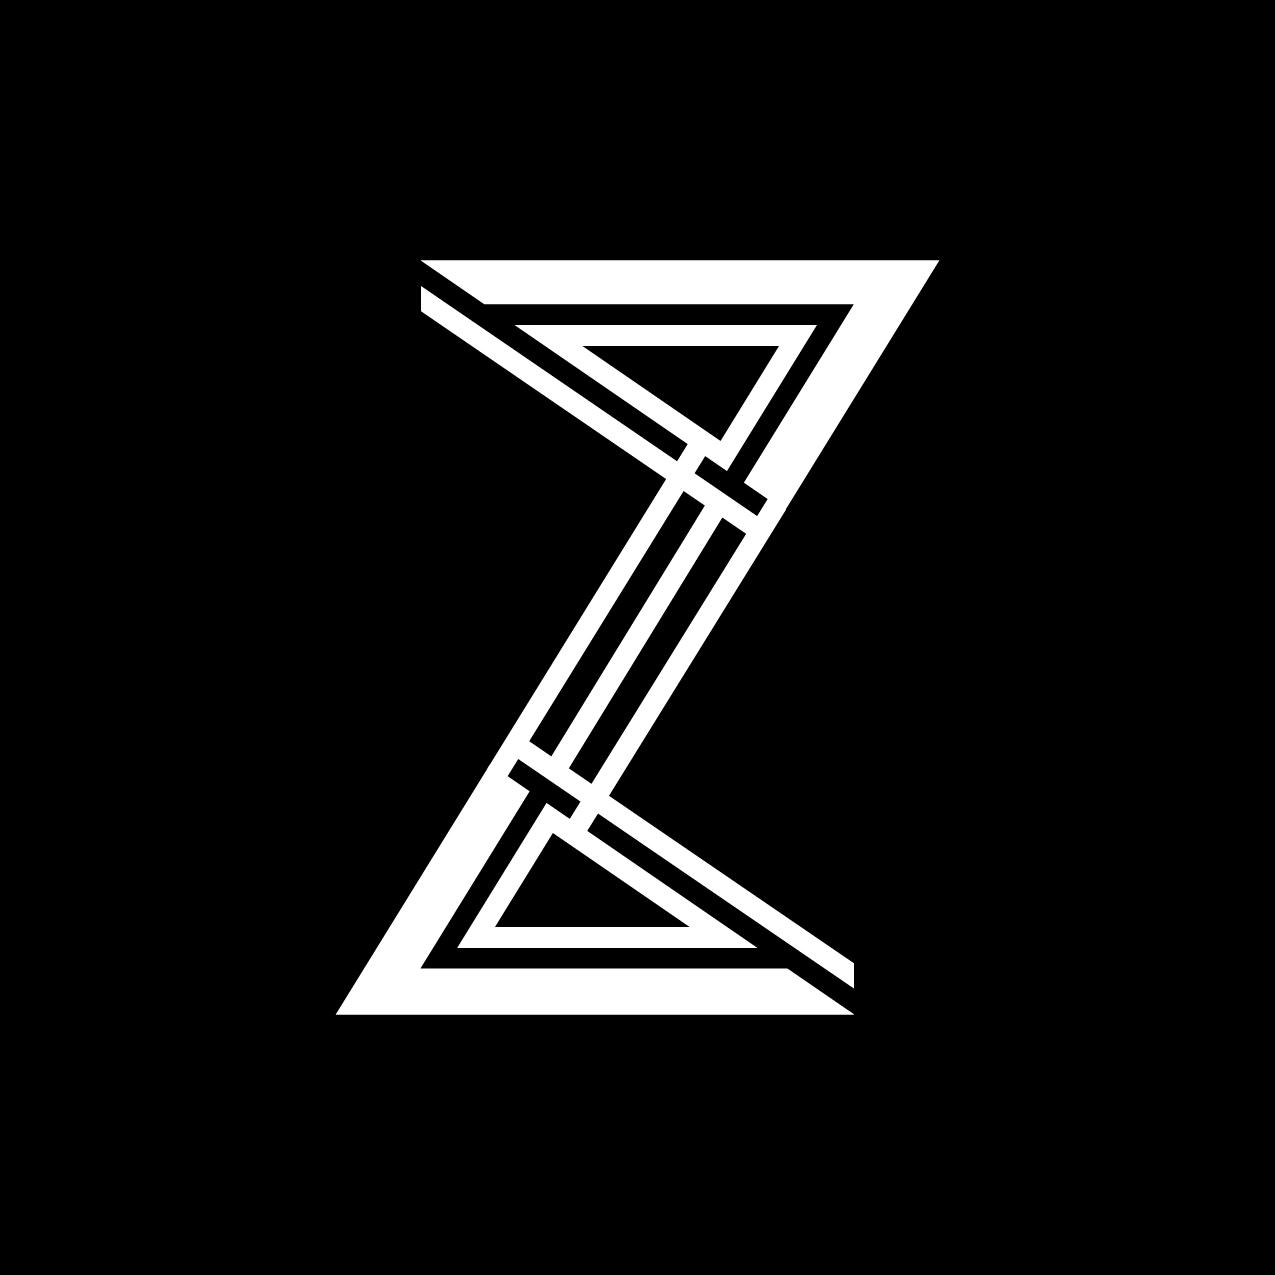 Letter Z4 Design by Furia